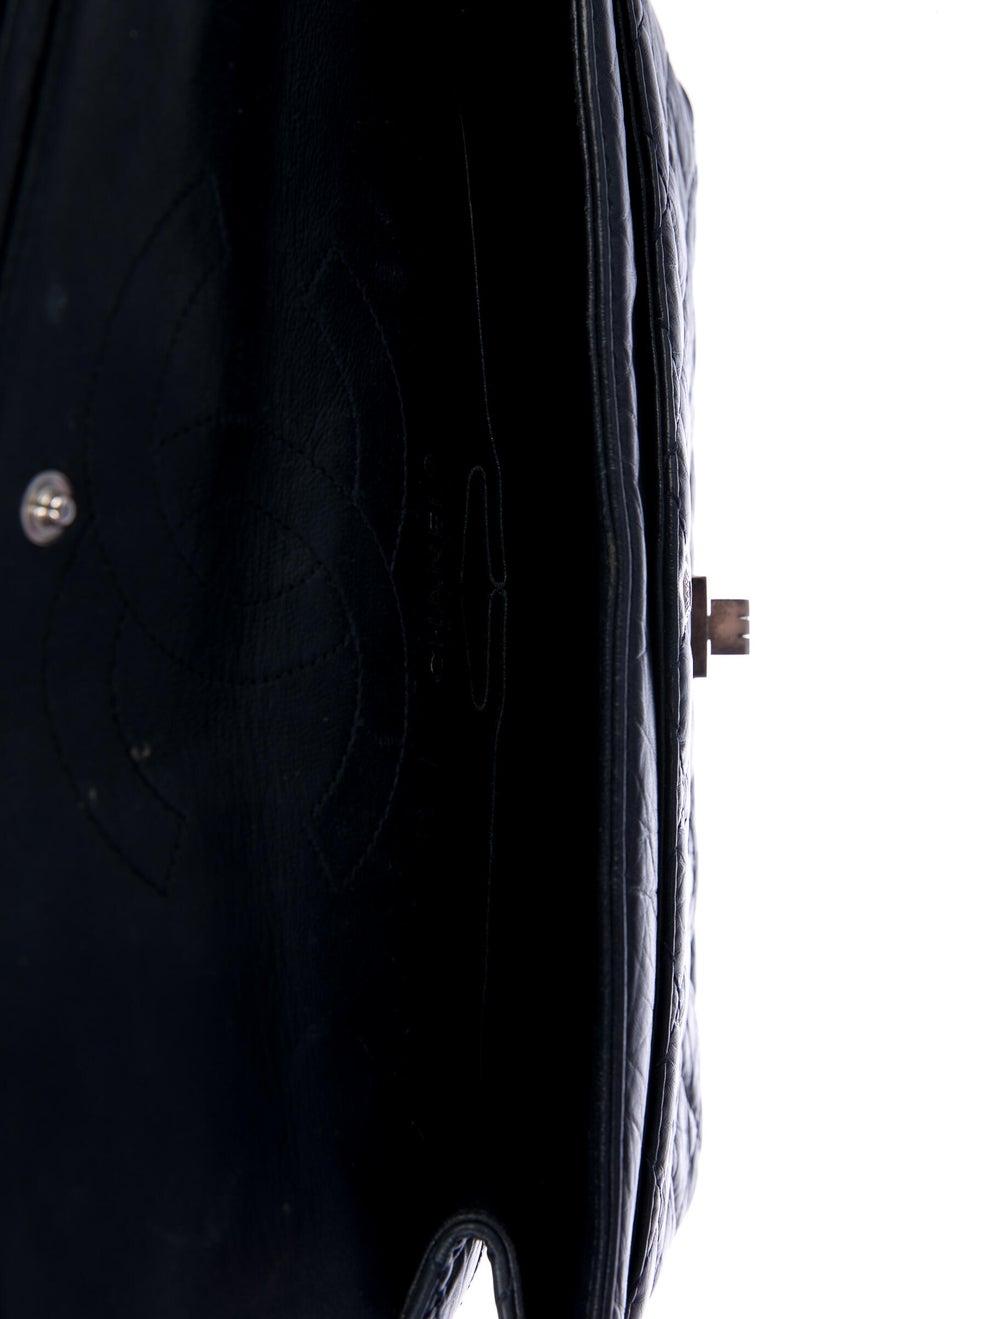 Chanel Reissue 226 Double Flap Bag Blue - image 5